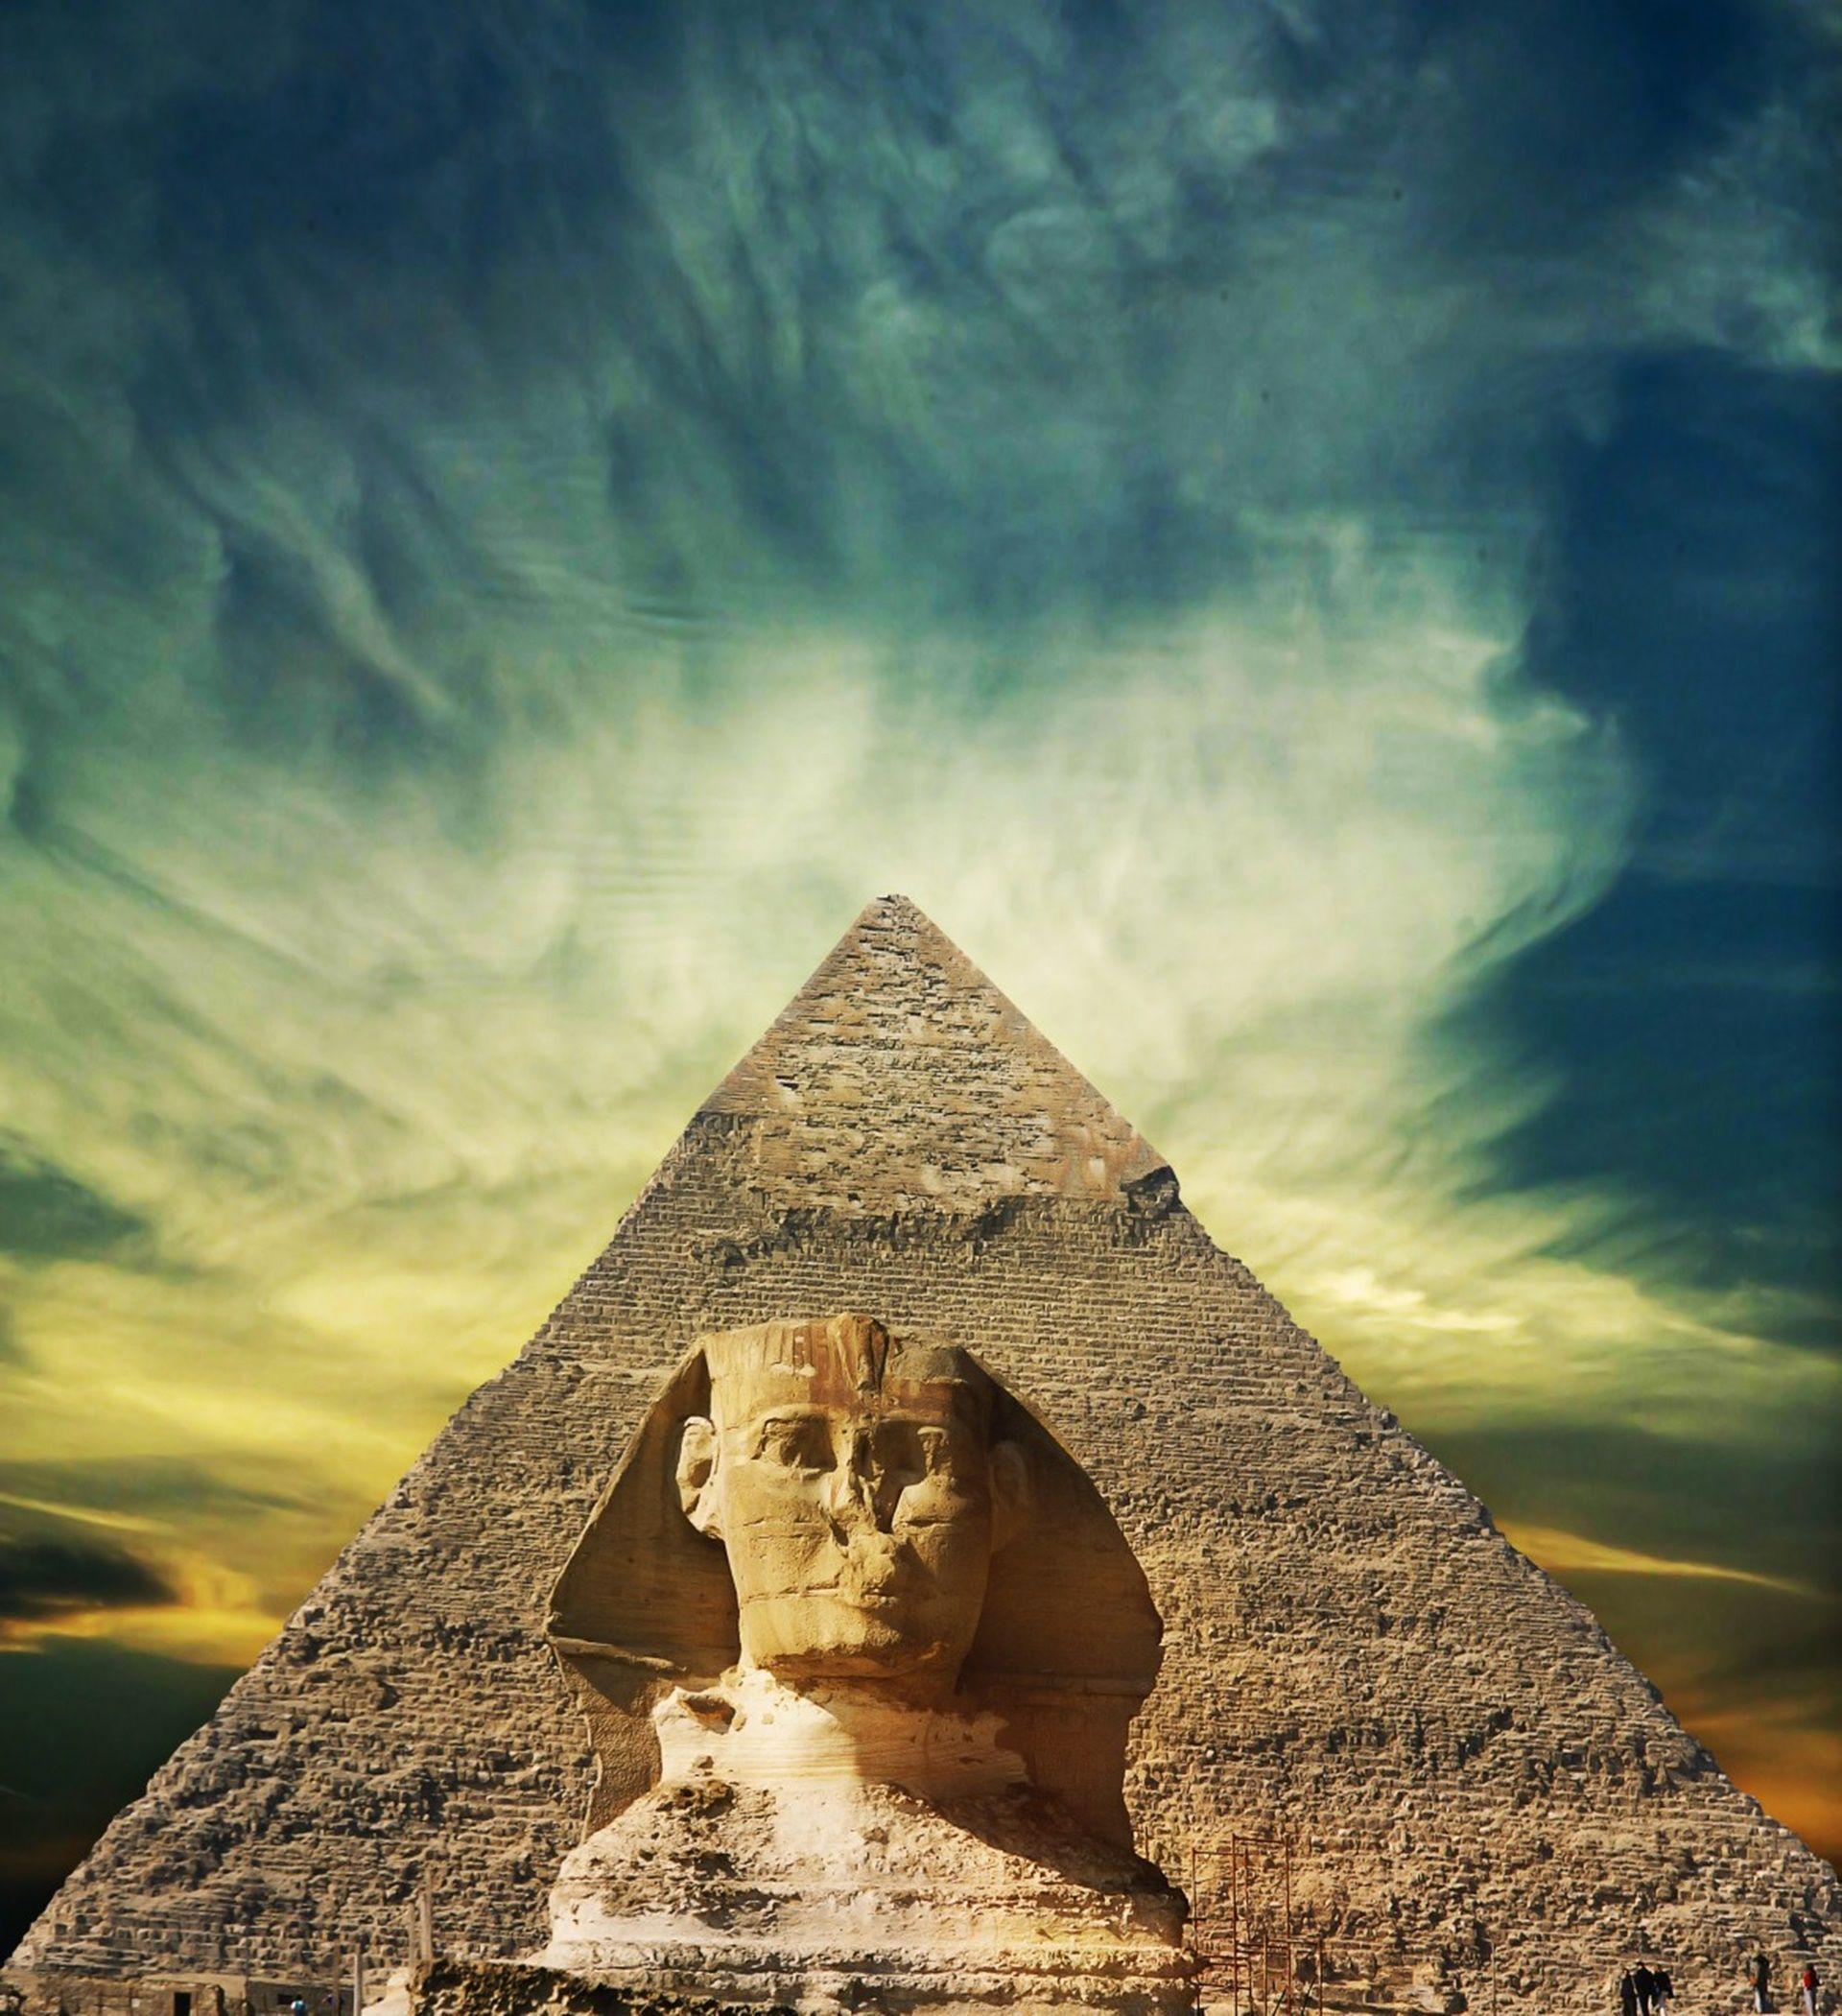 Egypt Wallpaper: Amazing HD Desktop Wallpapers From Egypt